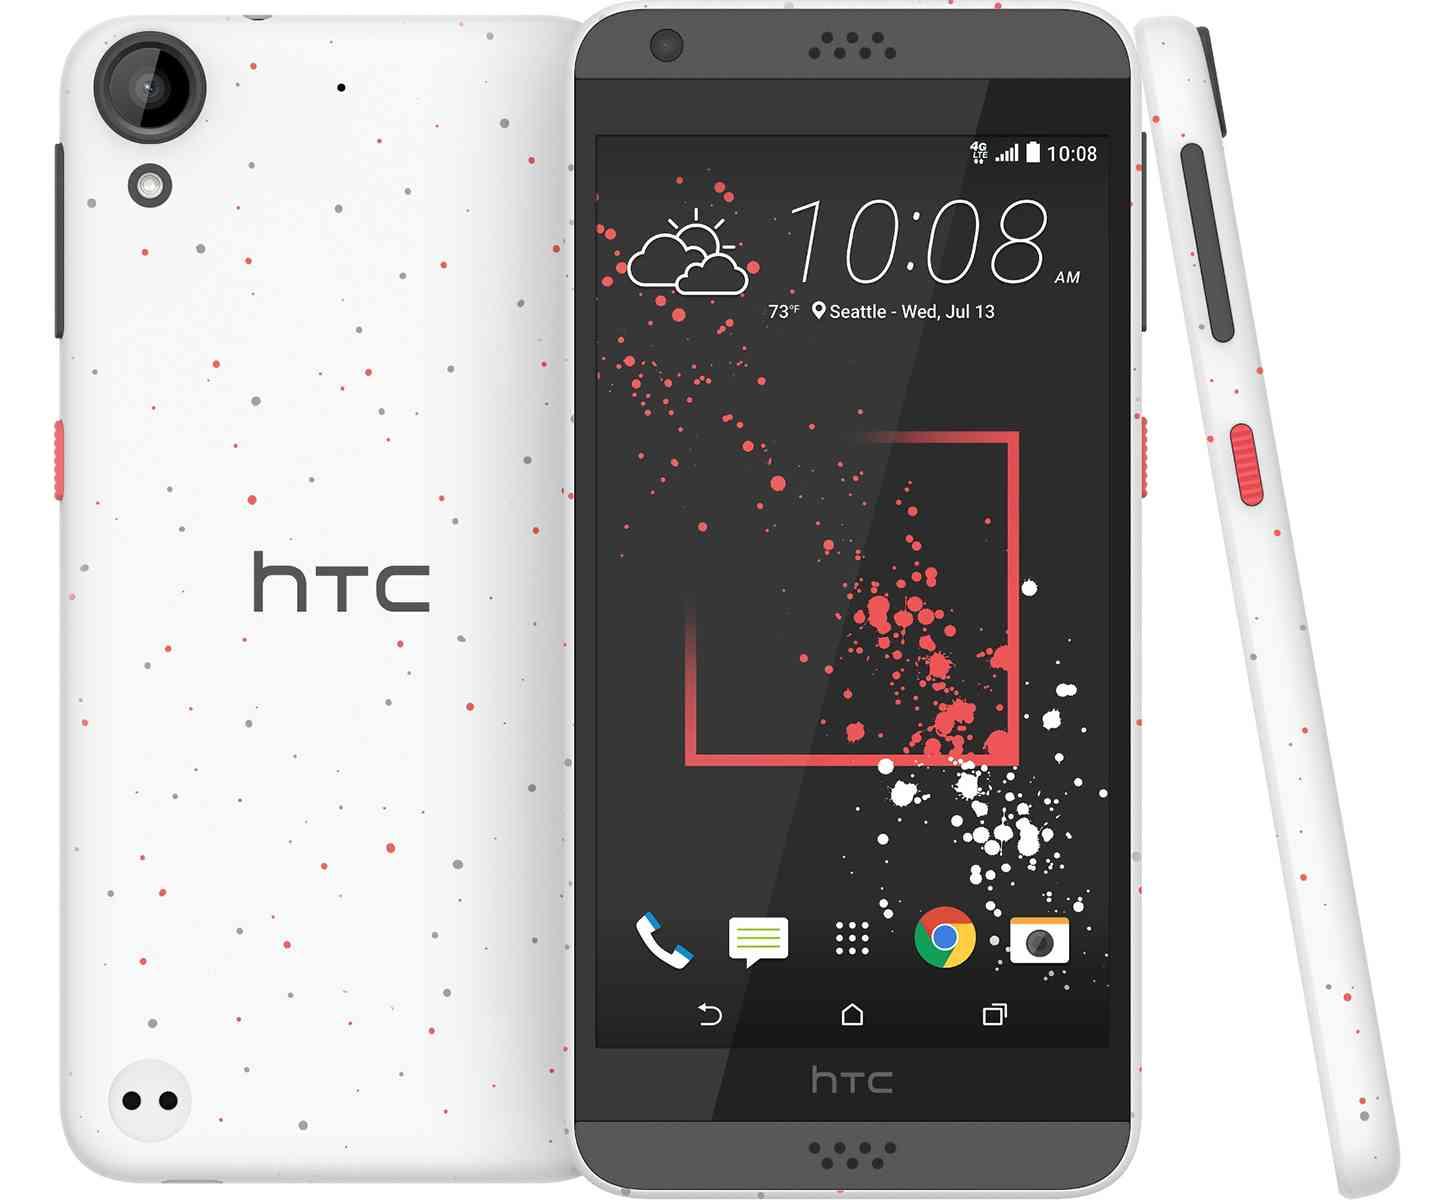 HTC Desire 530 micro-splash